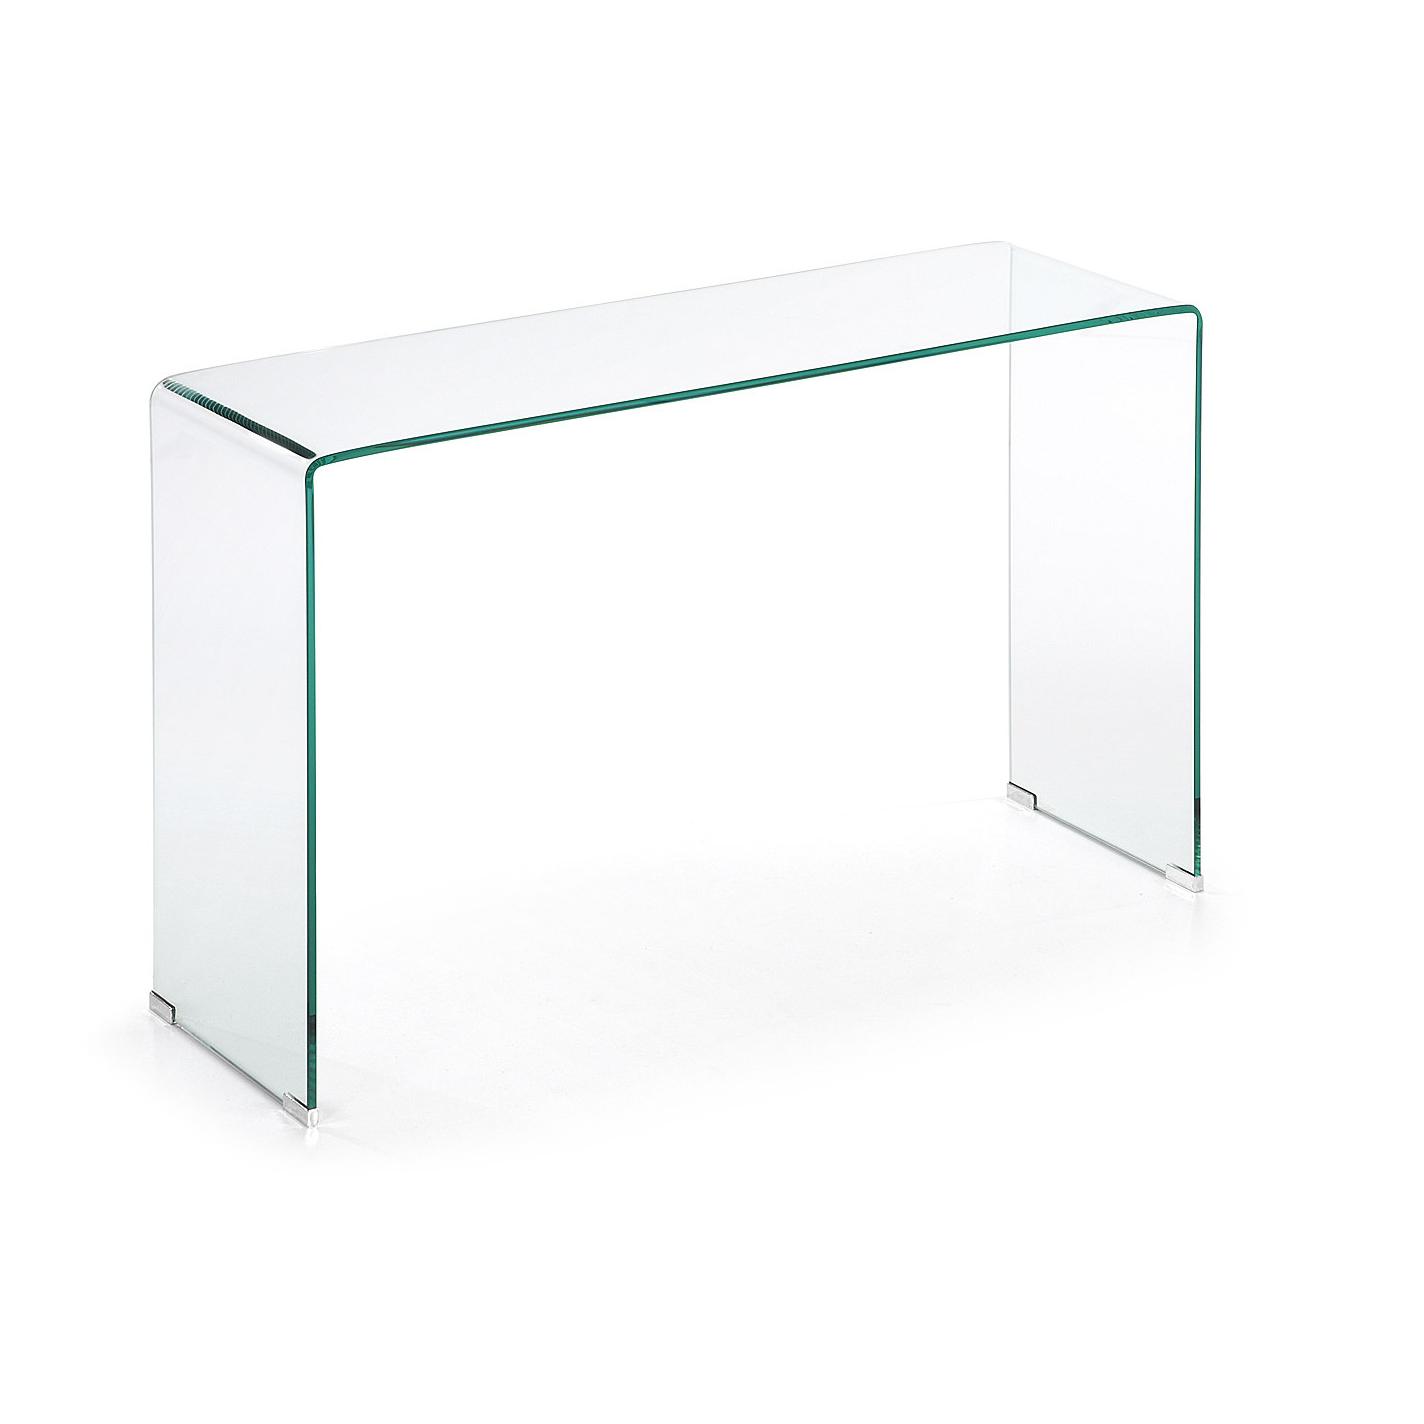 Sidetable Glas Metaal.Kave Home Glazen Sidetable Burano 125 X 40 Cm